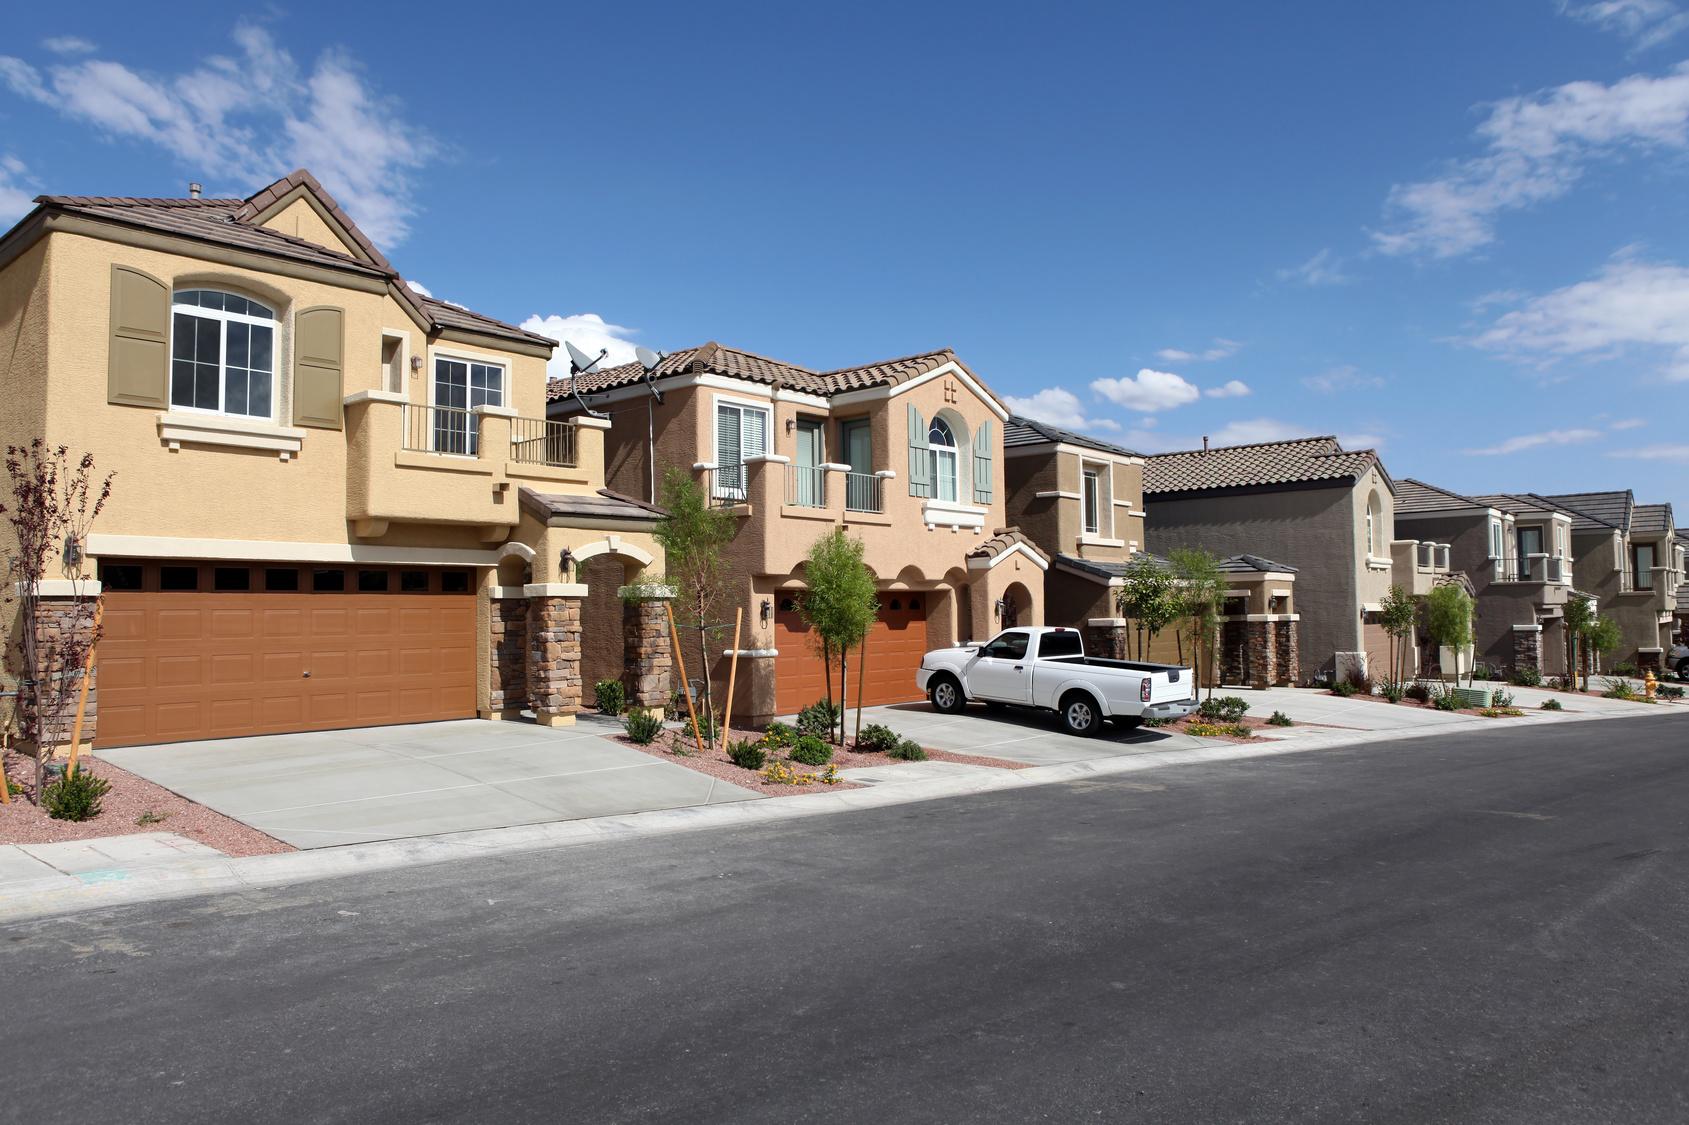 Glendale property management company